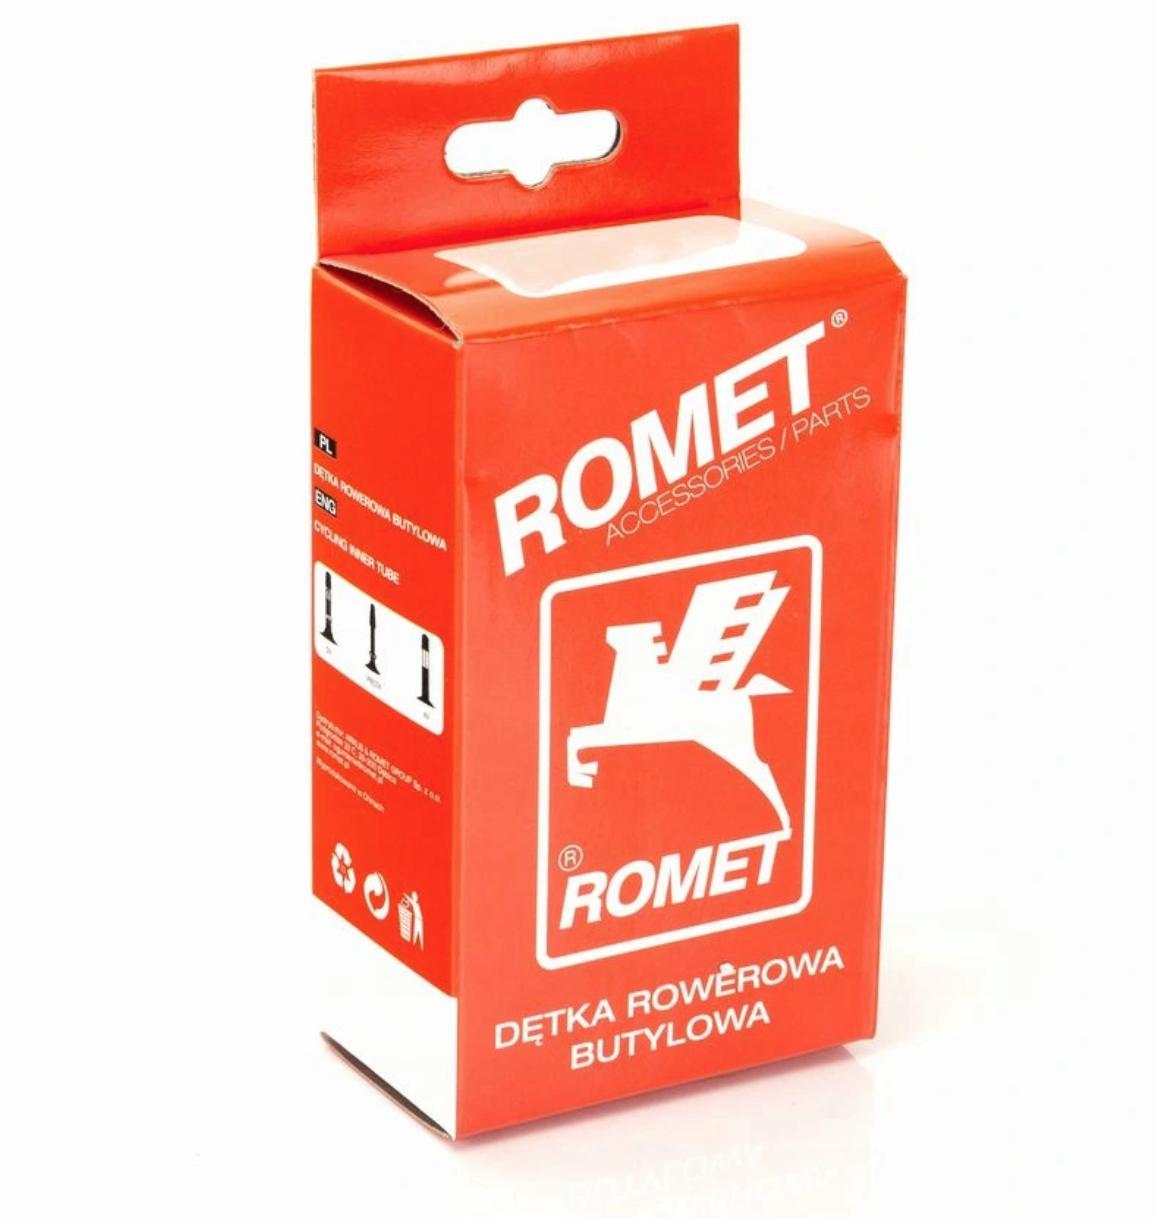 Камера для велосипеда Romet 28 x 1 3/8 x 1 5/8 FV L-48